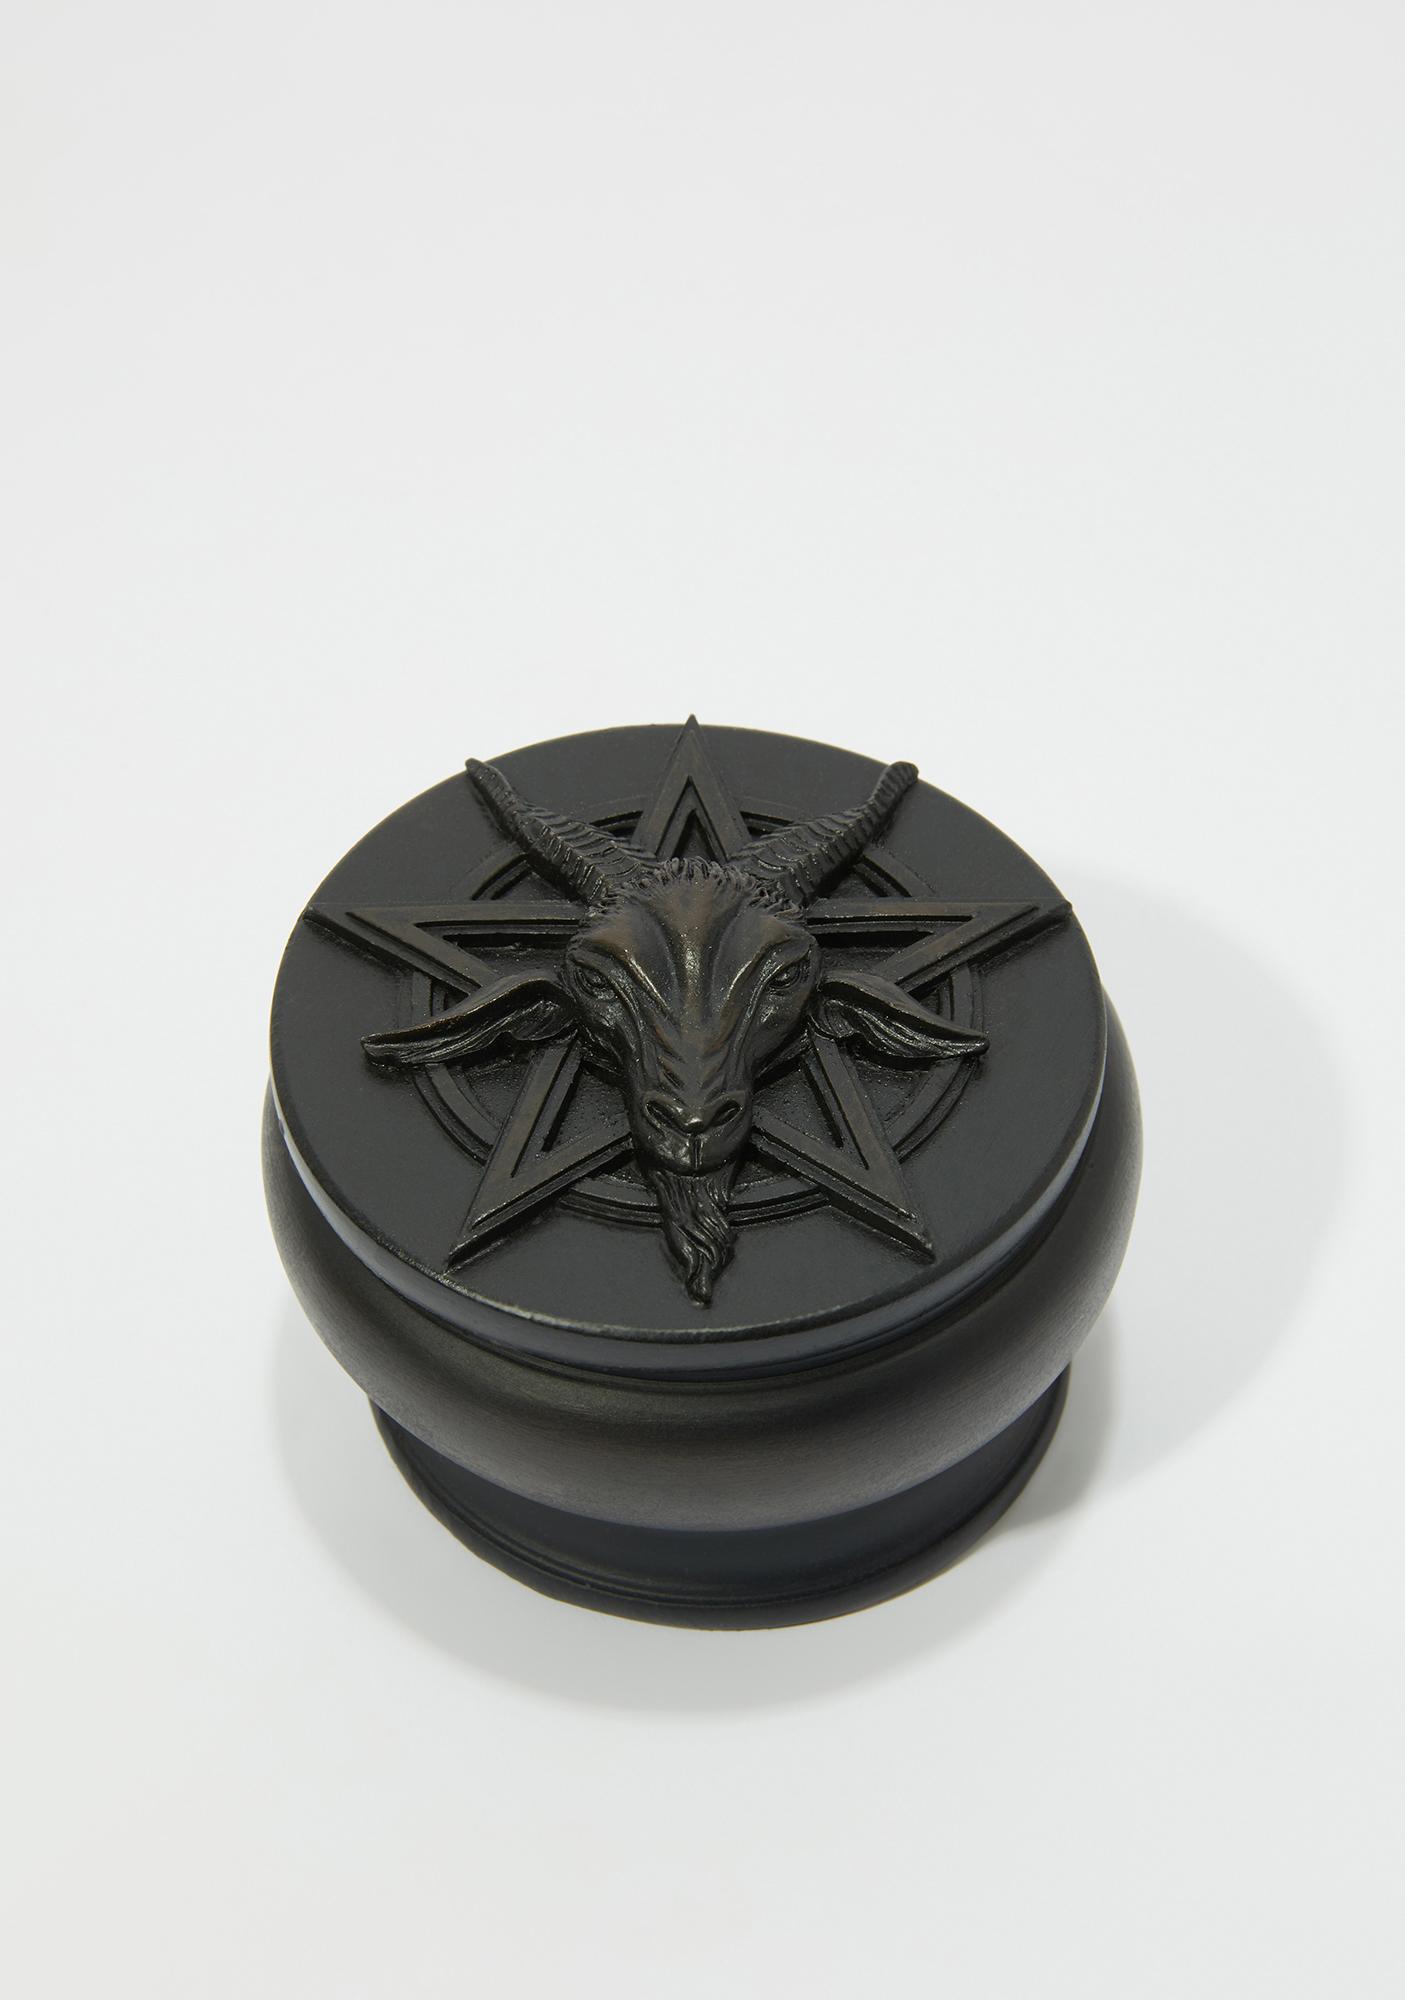 Alchemy England Black Baphomet Box